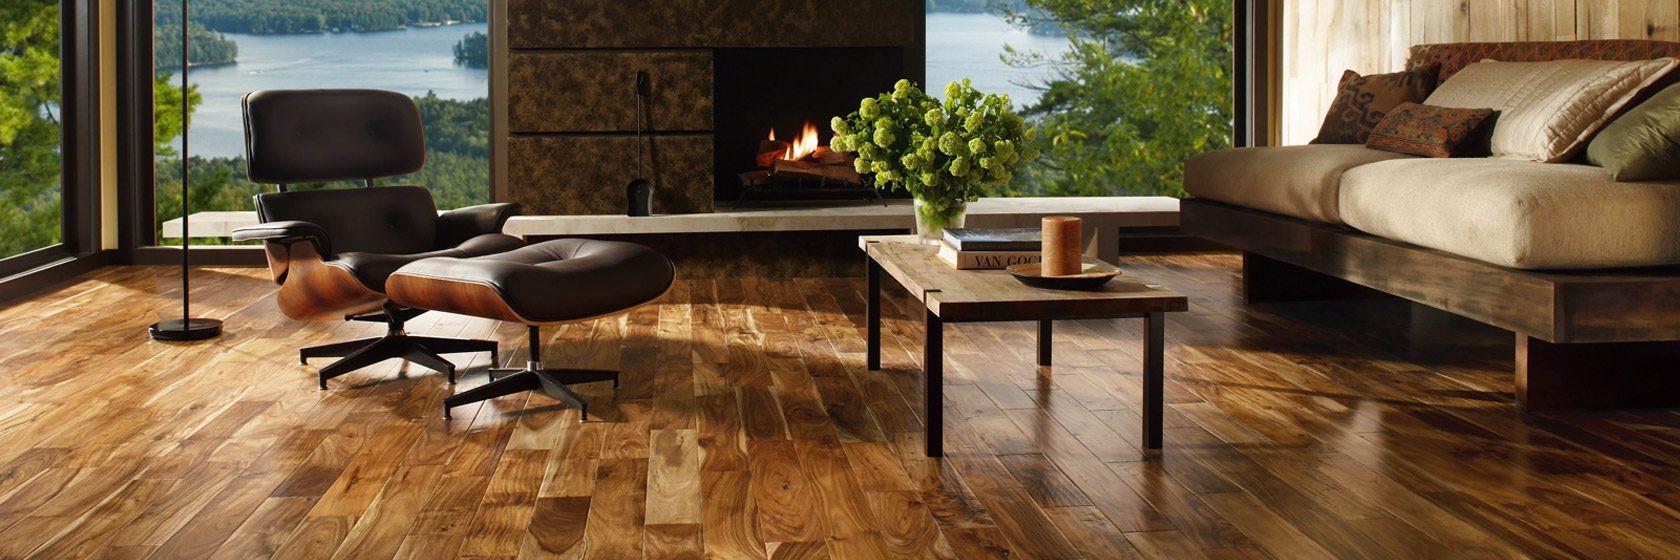 naf hardwood flooring canada of acacia engineered hardwood natural ehs5300 intended for hero l 1680 560